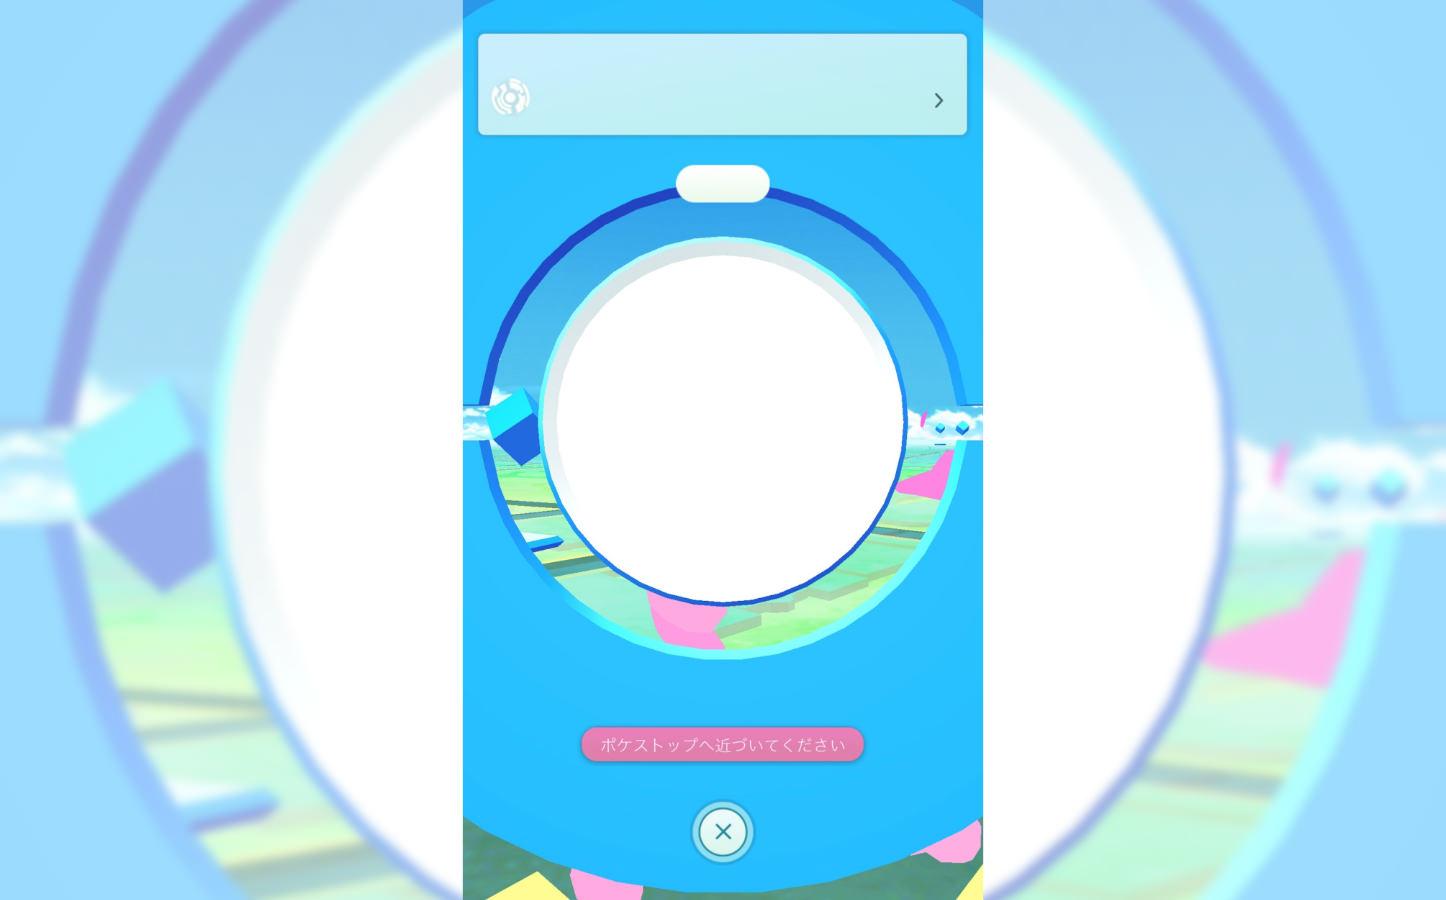 Pokemon servers are down in japan